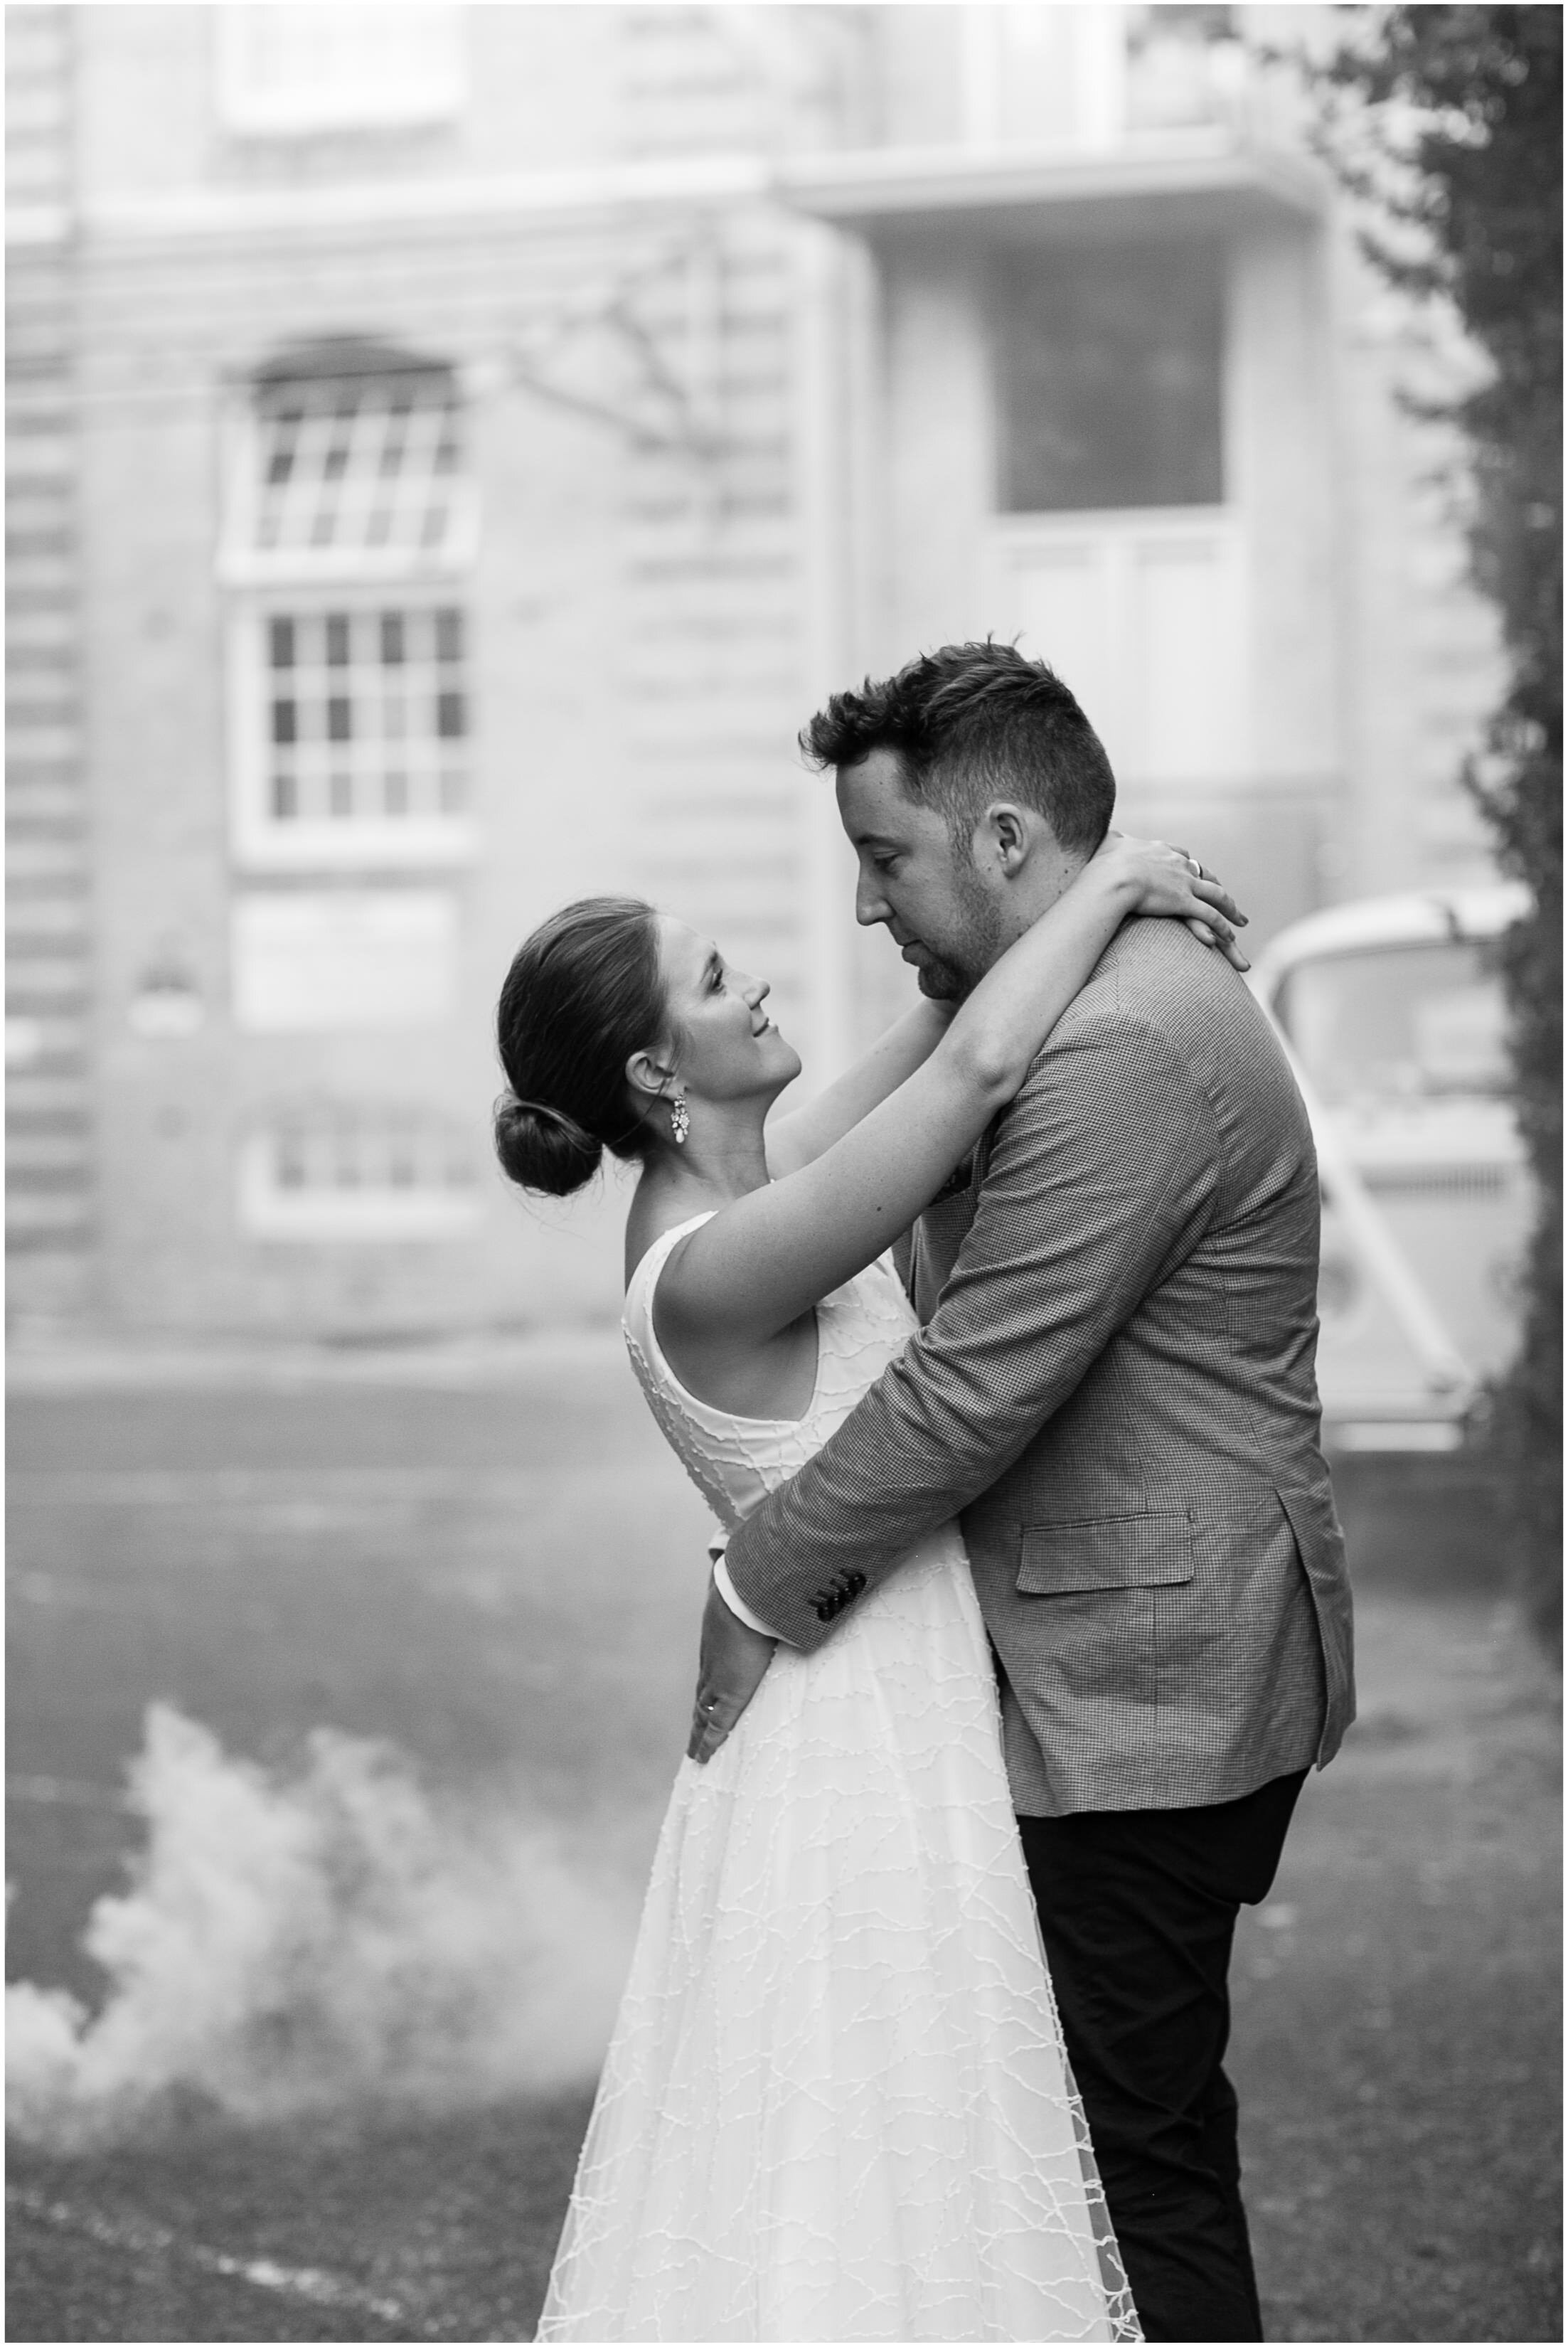 refinery-brisbane-wedding-photography-film-photographer-fine-art-52.jpg